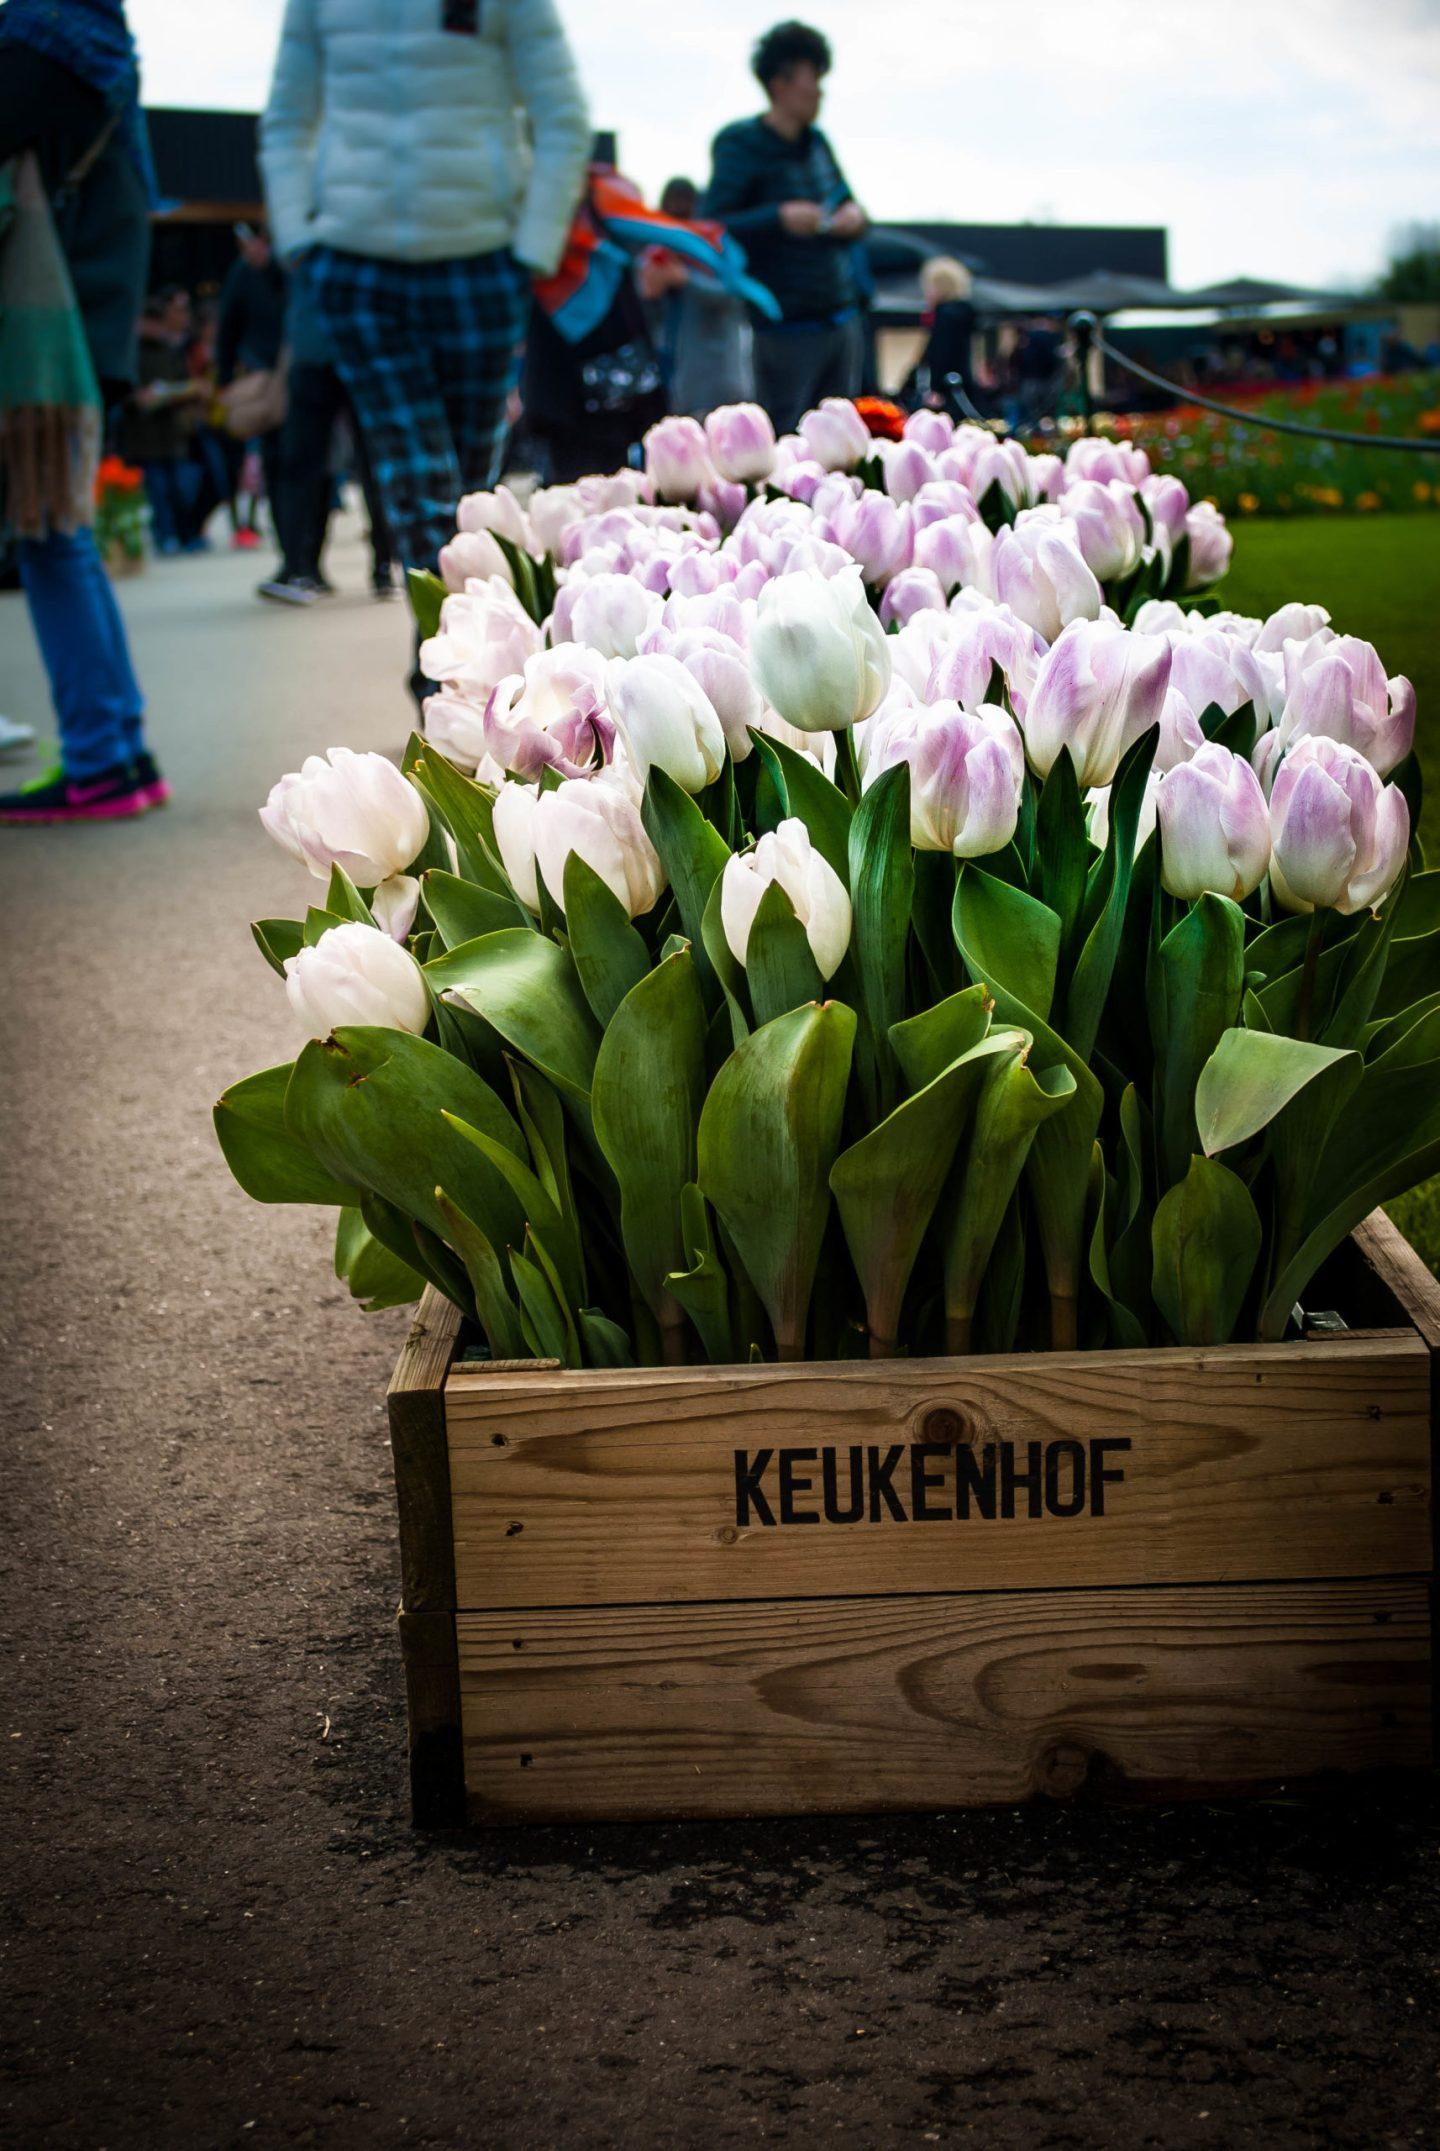 Visit the Keukenhof Tulips